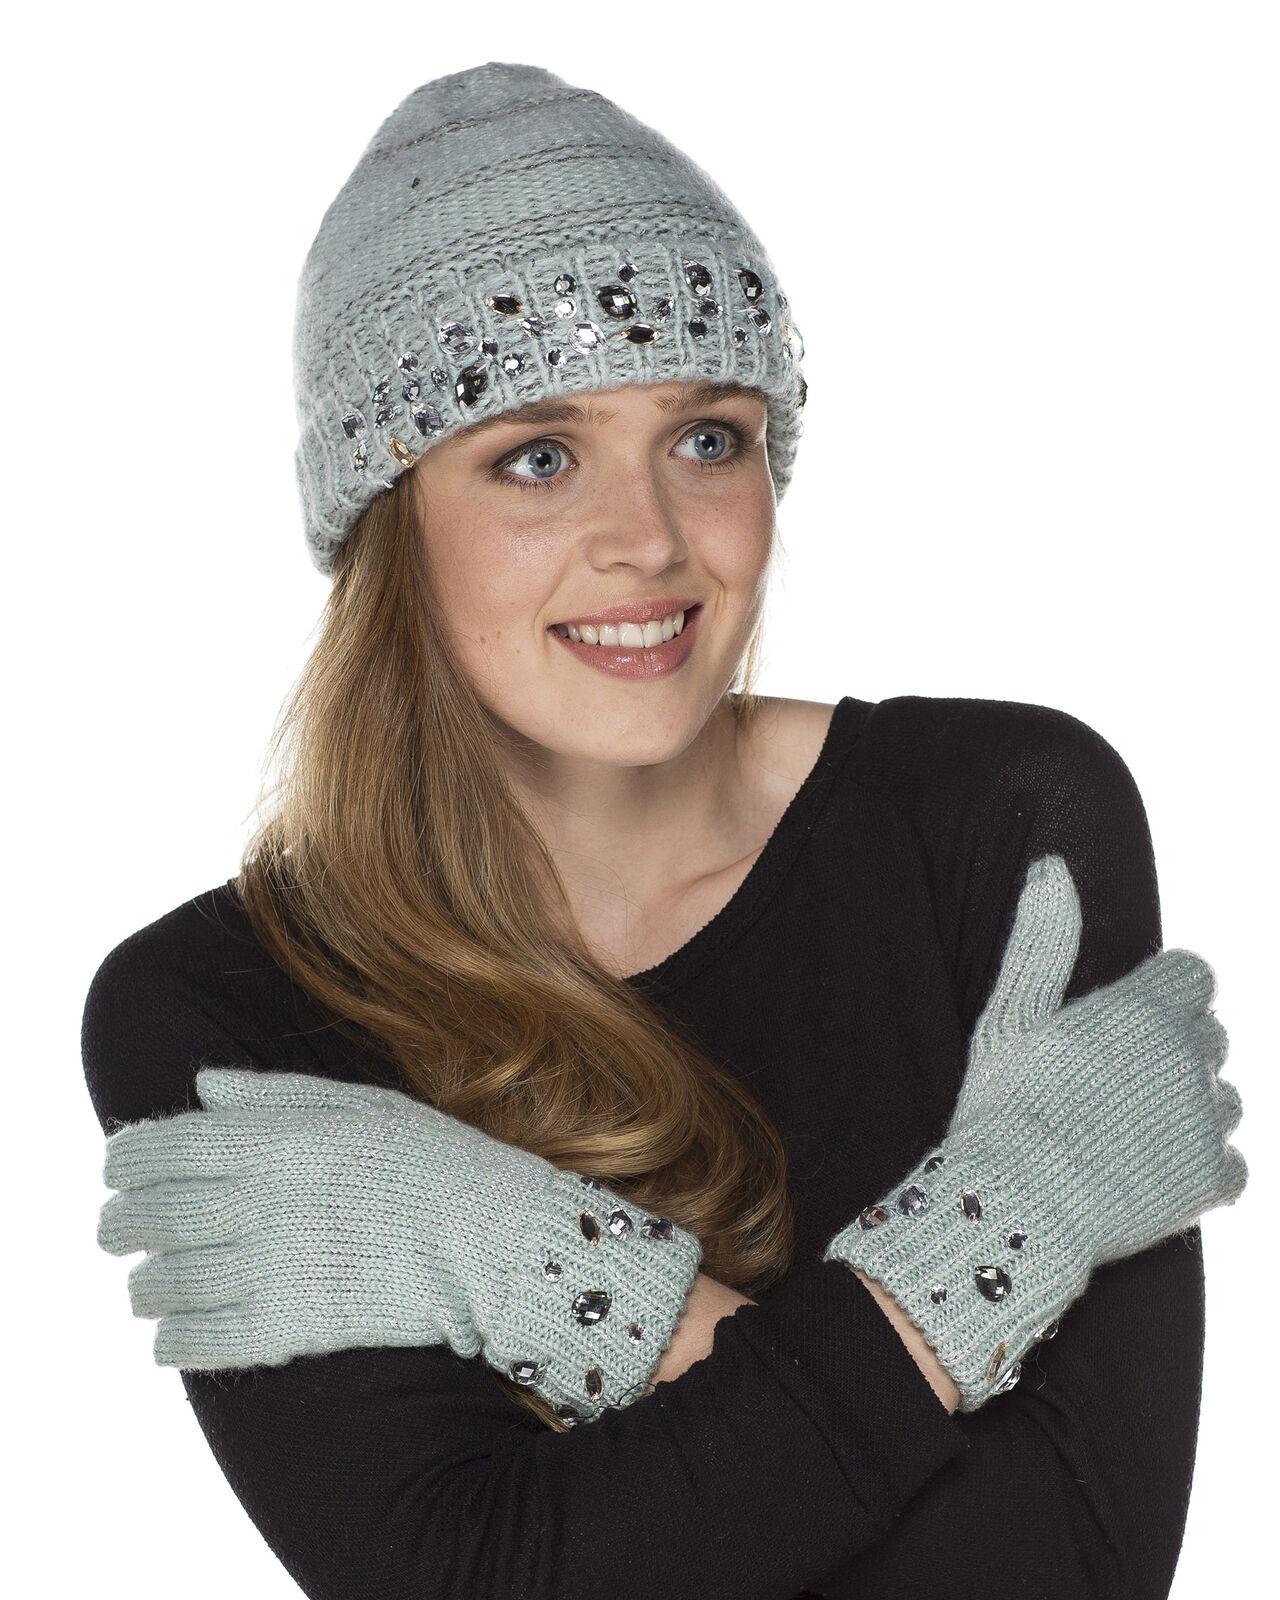 i-Smalls Women's Julie Knit Beanie Hat and Glove Set with Jewel Trim (Mint)